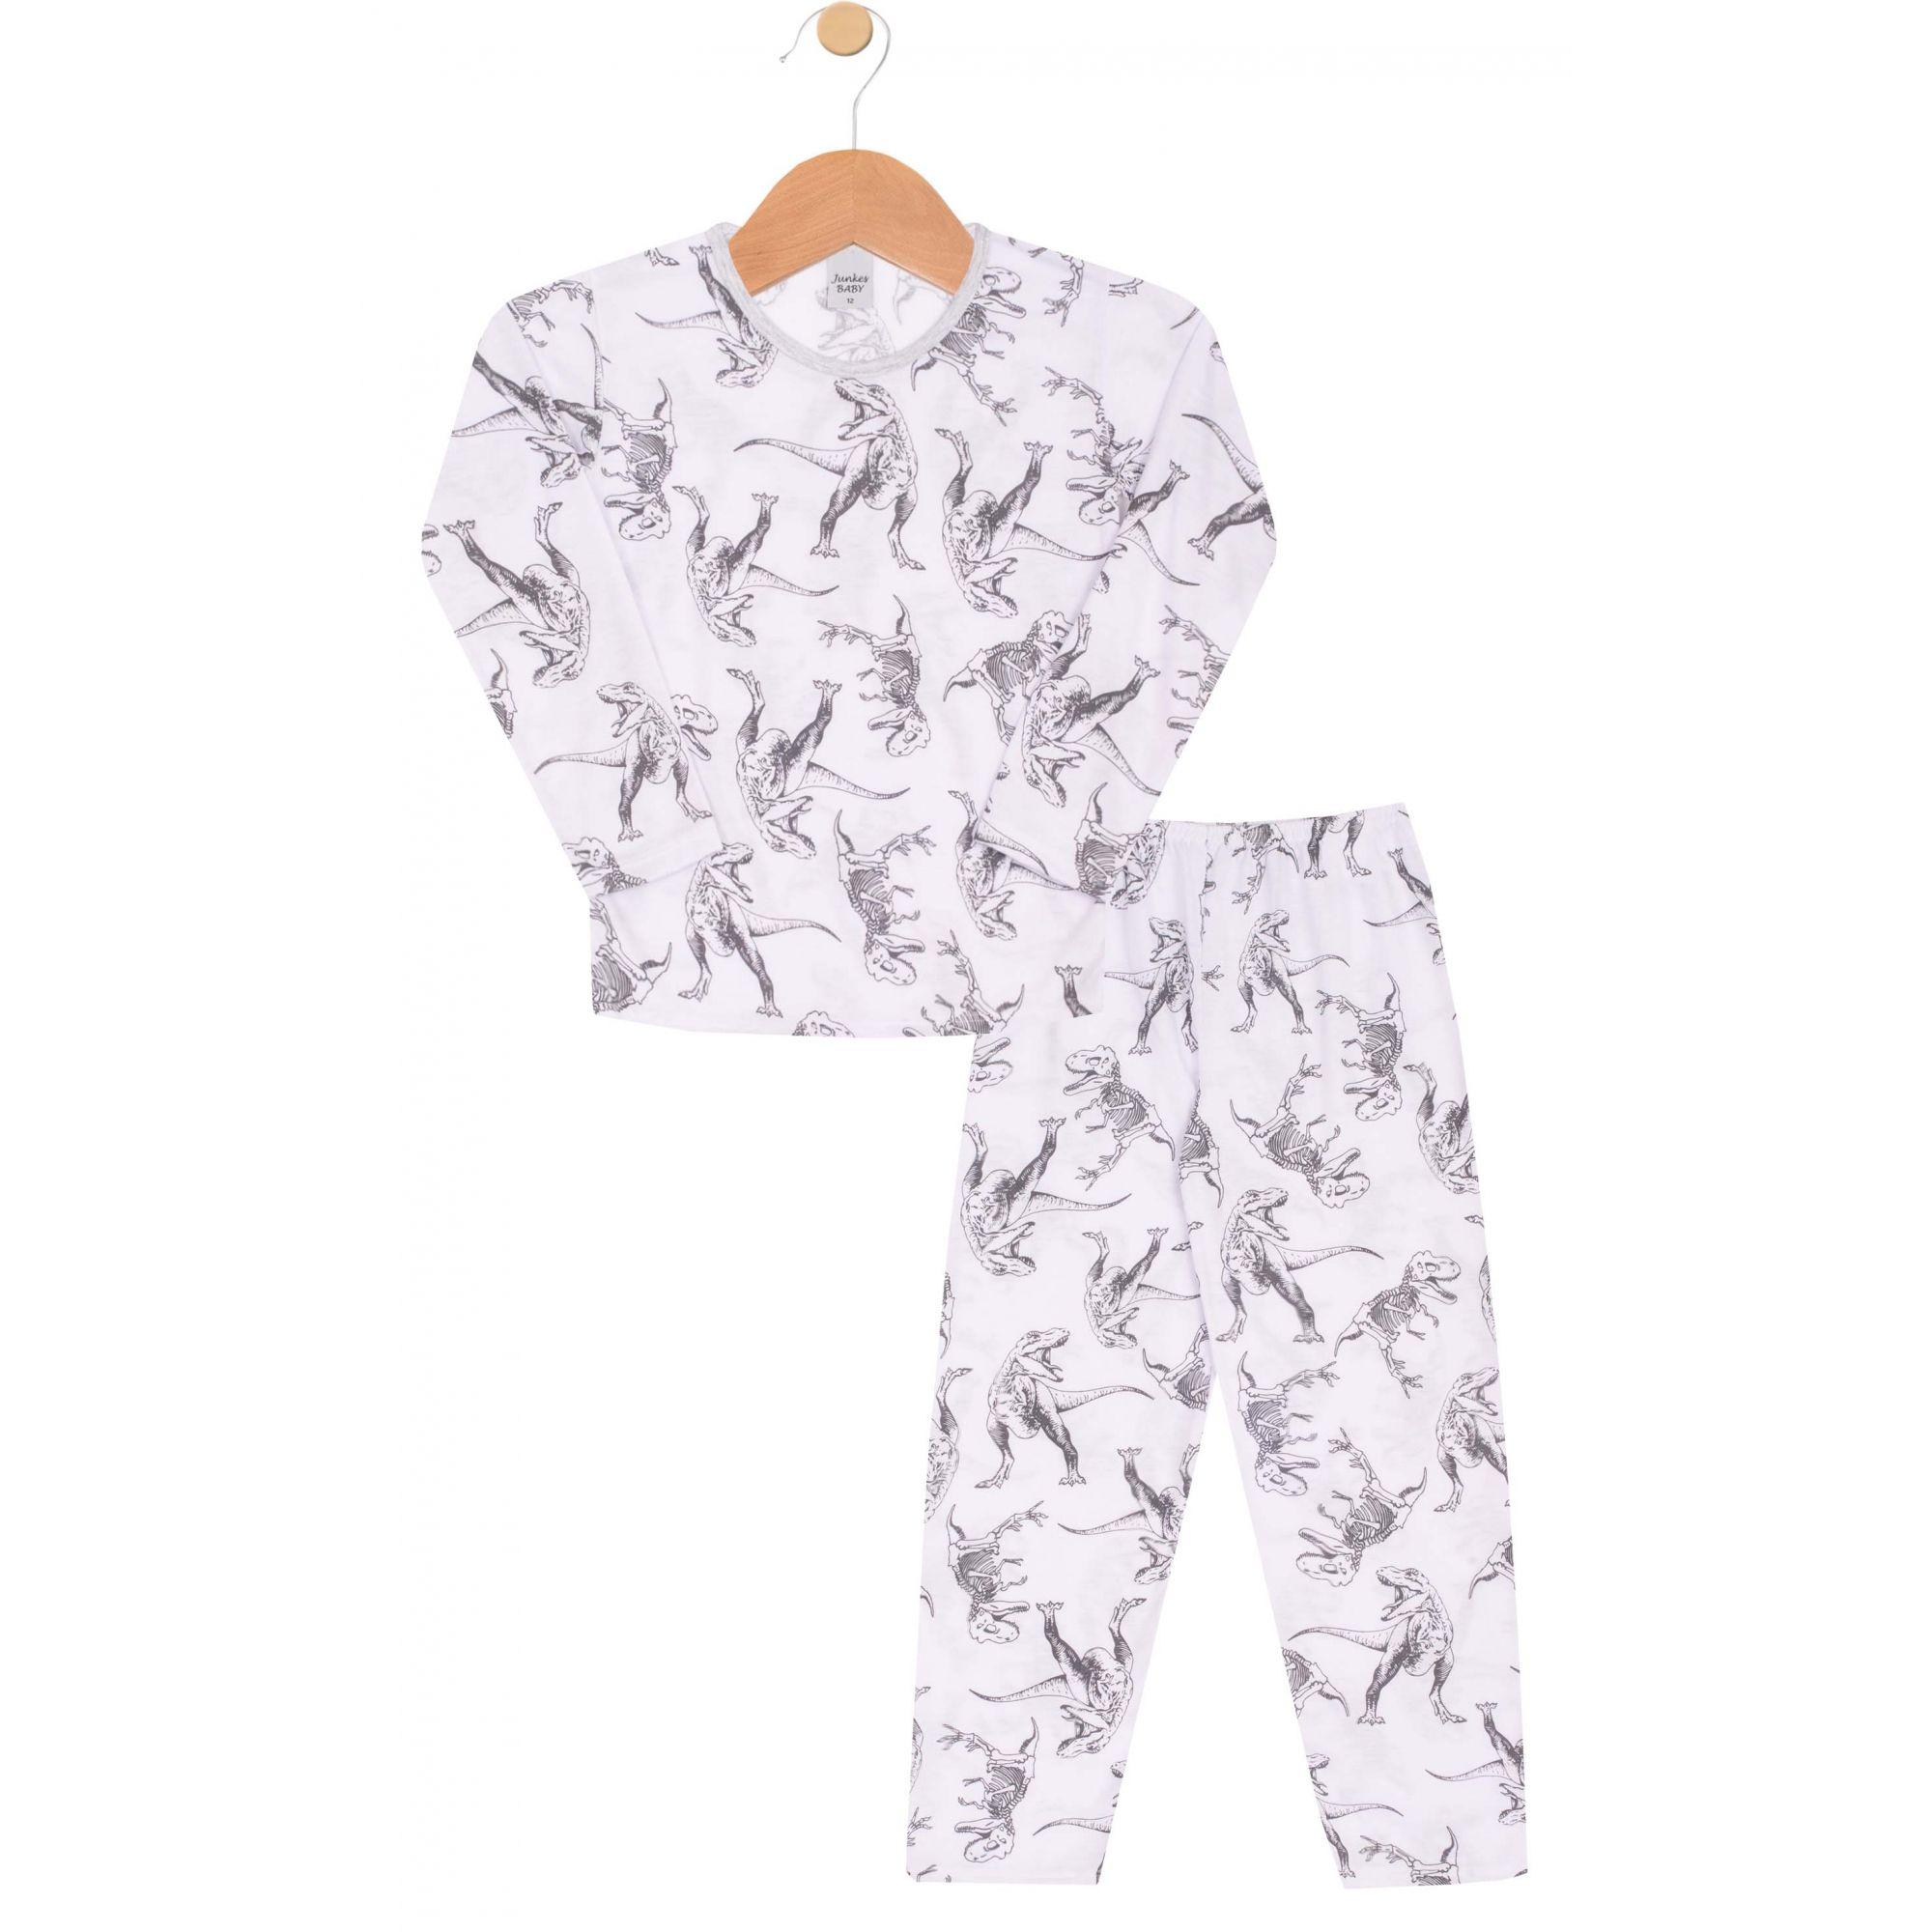 Pijama Dino Esqueleto Junkes Baby